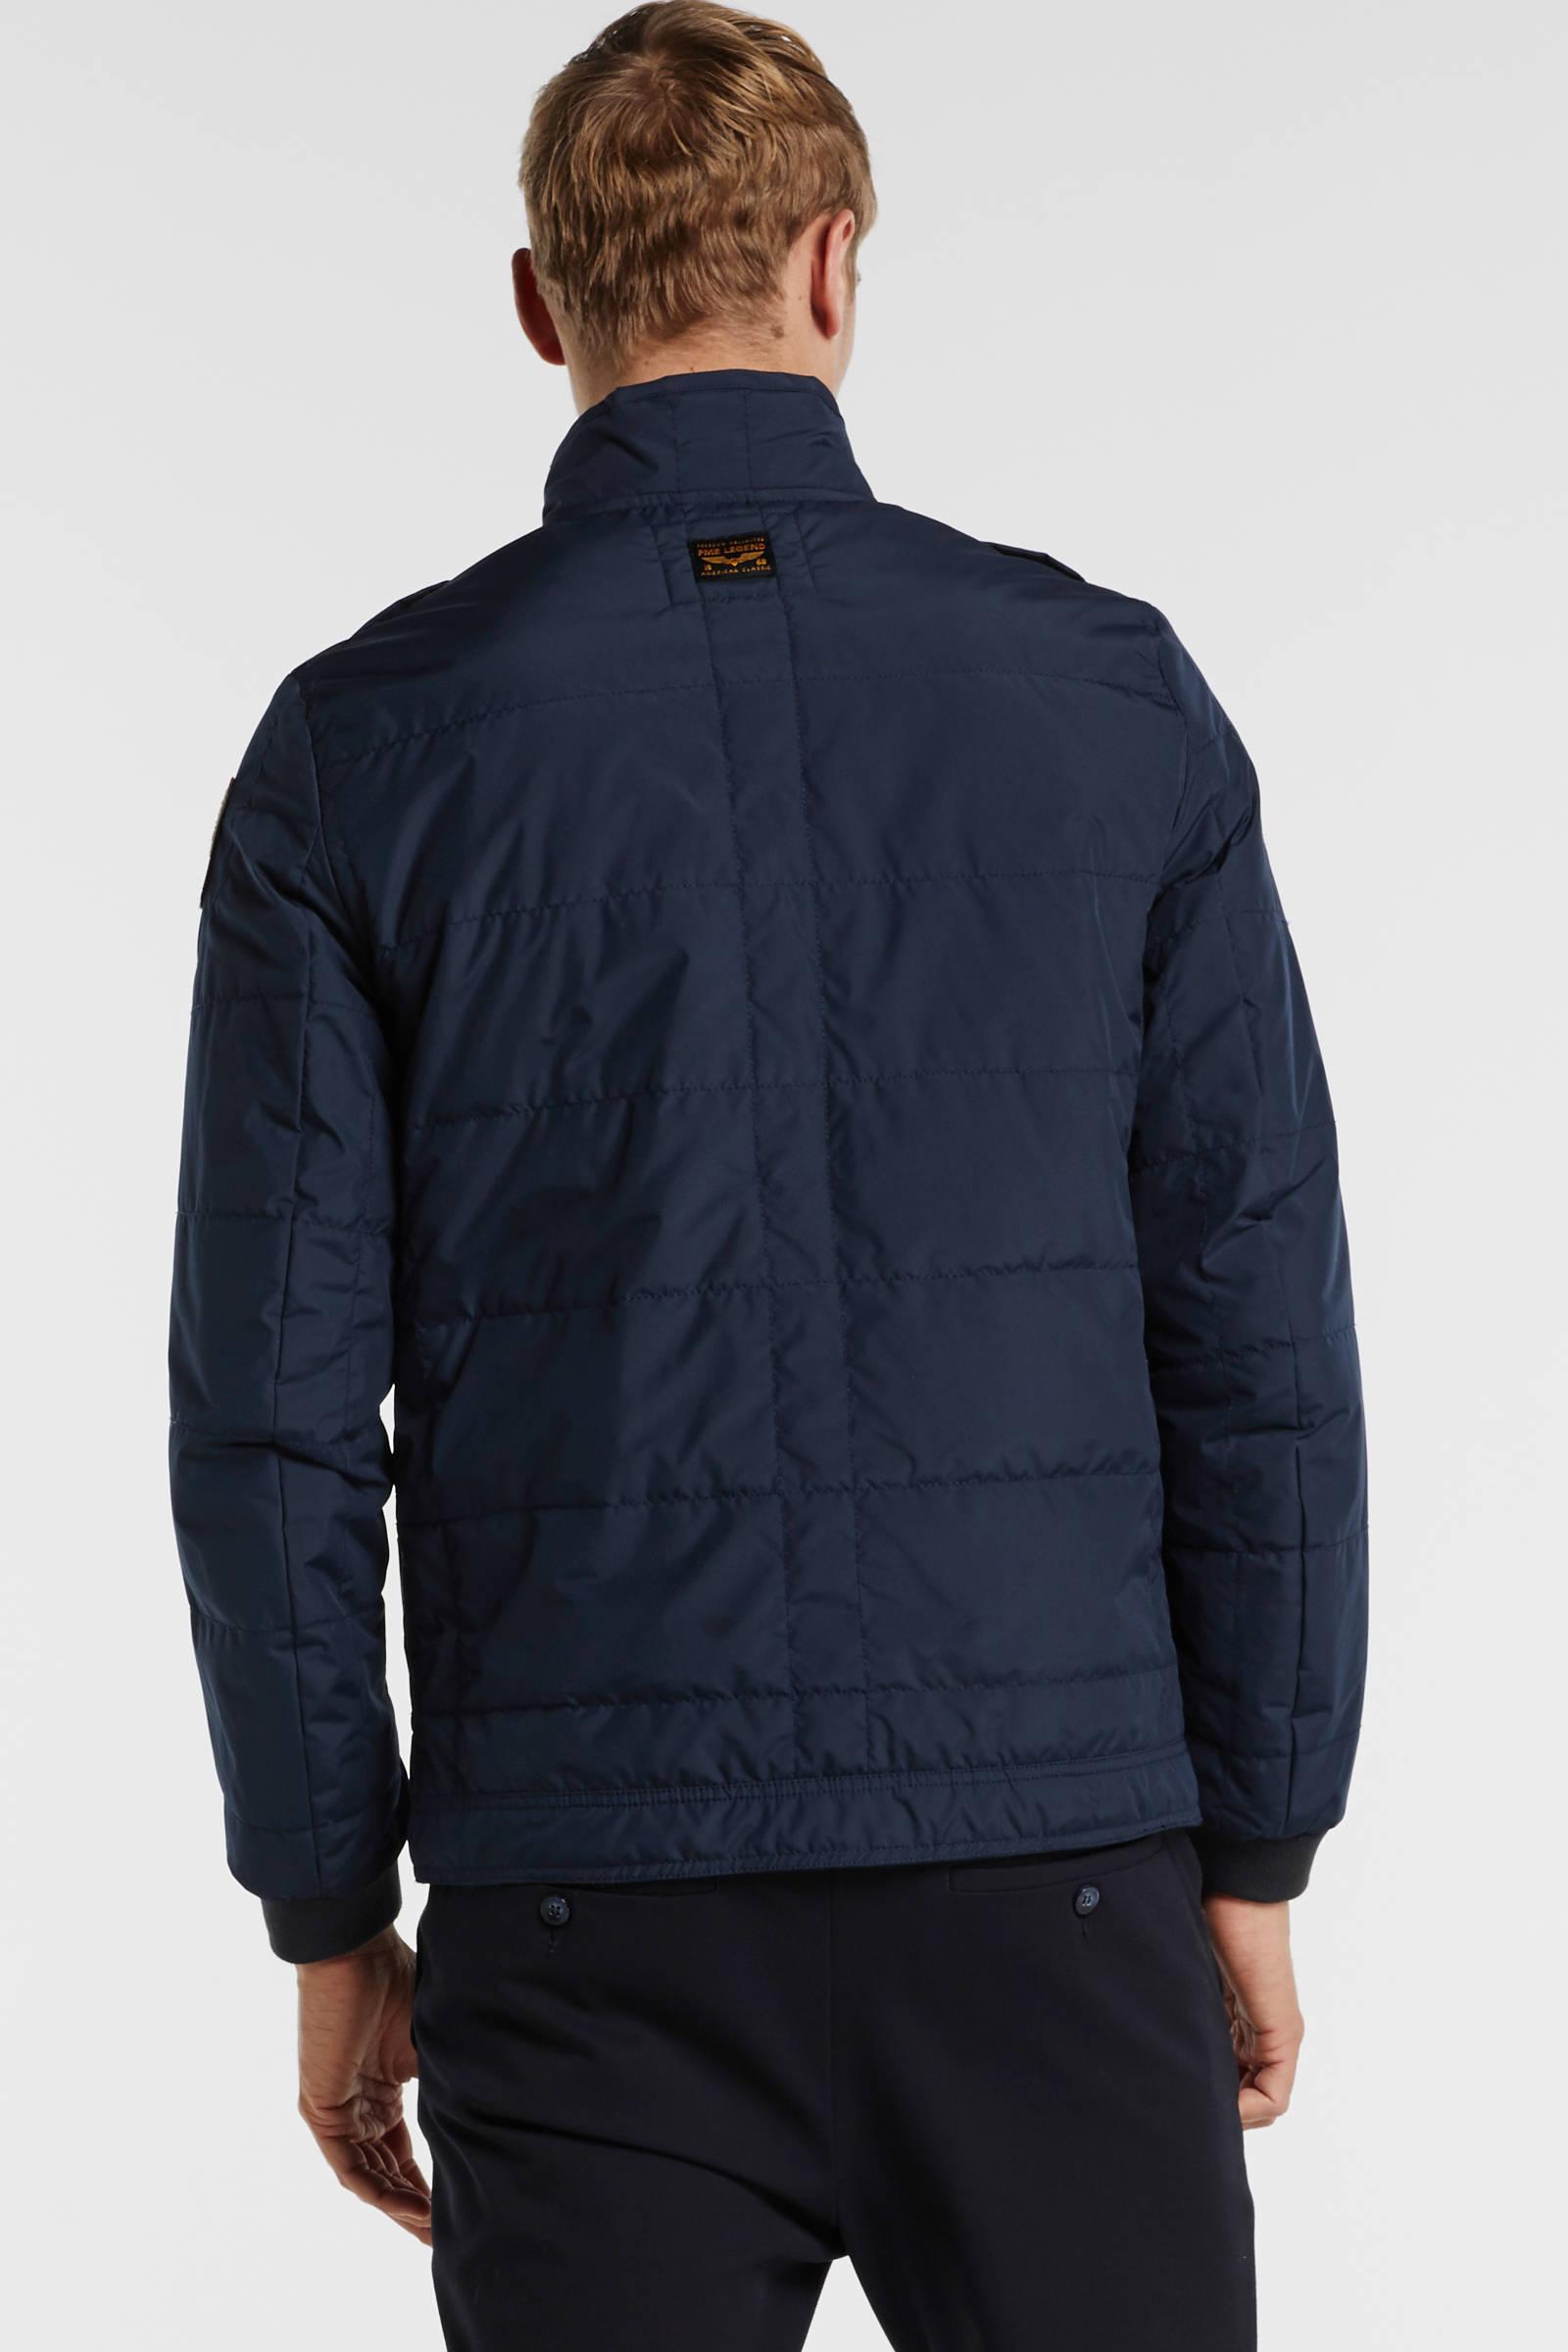 PME Legend zomerjas donkerblauw | wehkamp